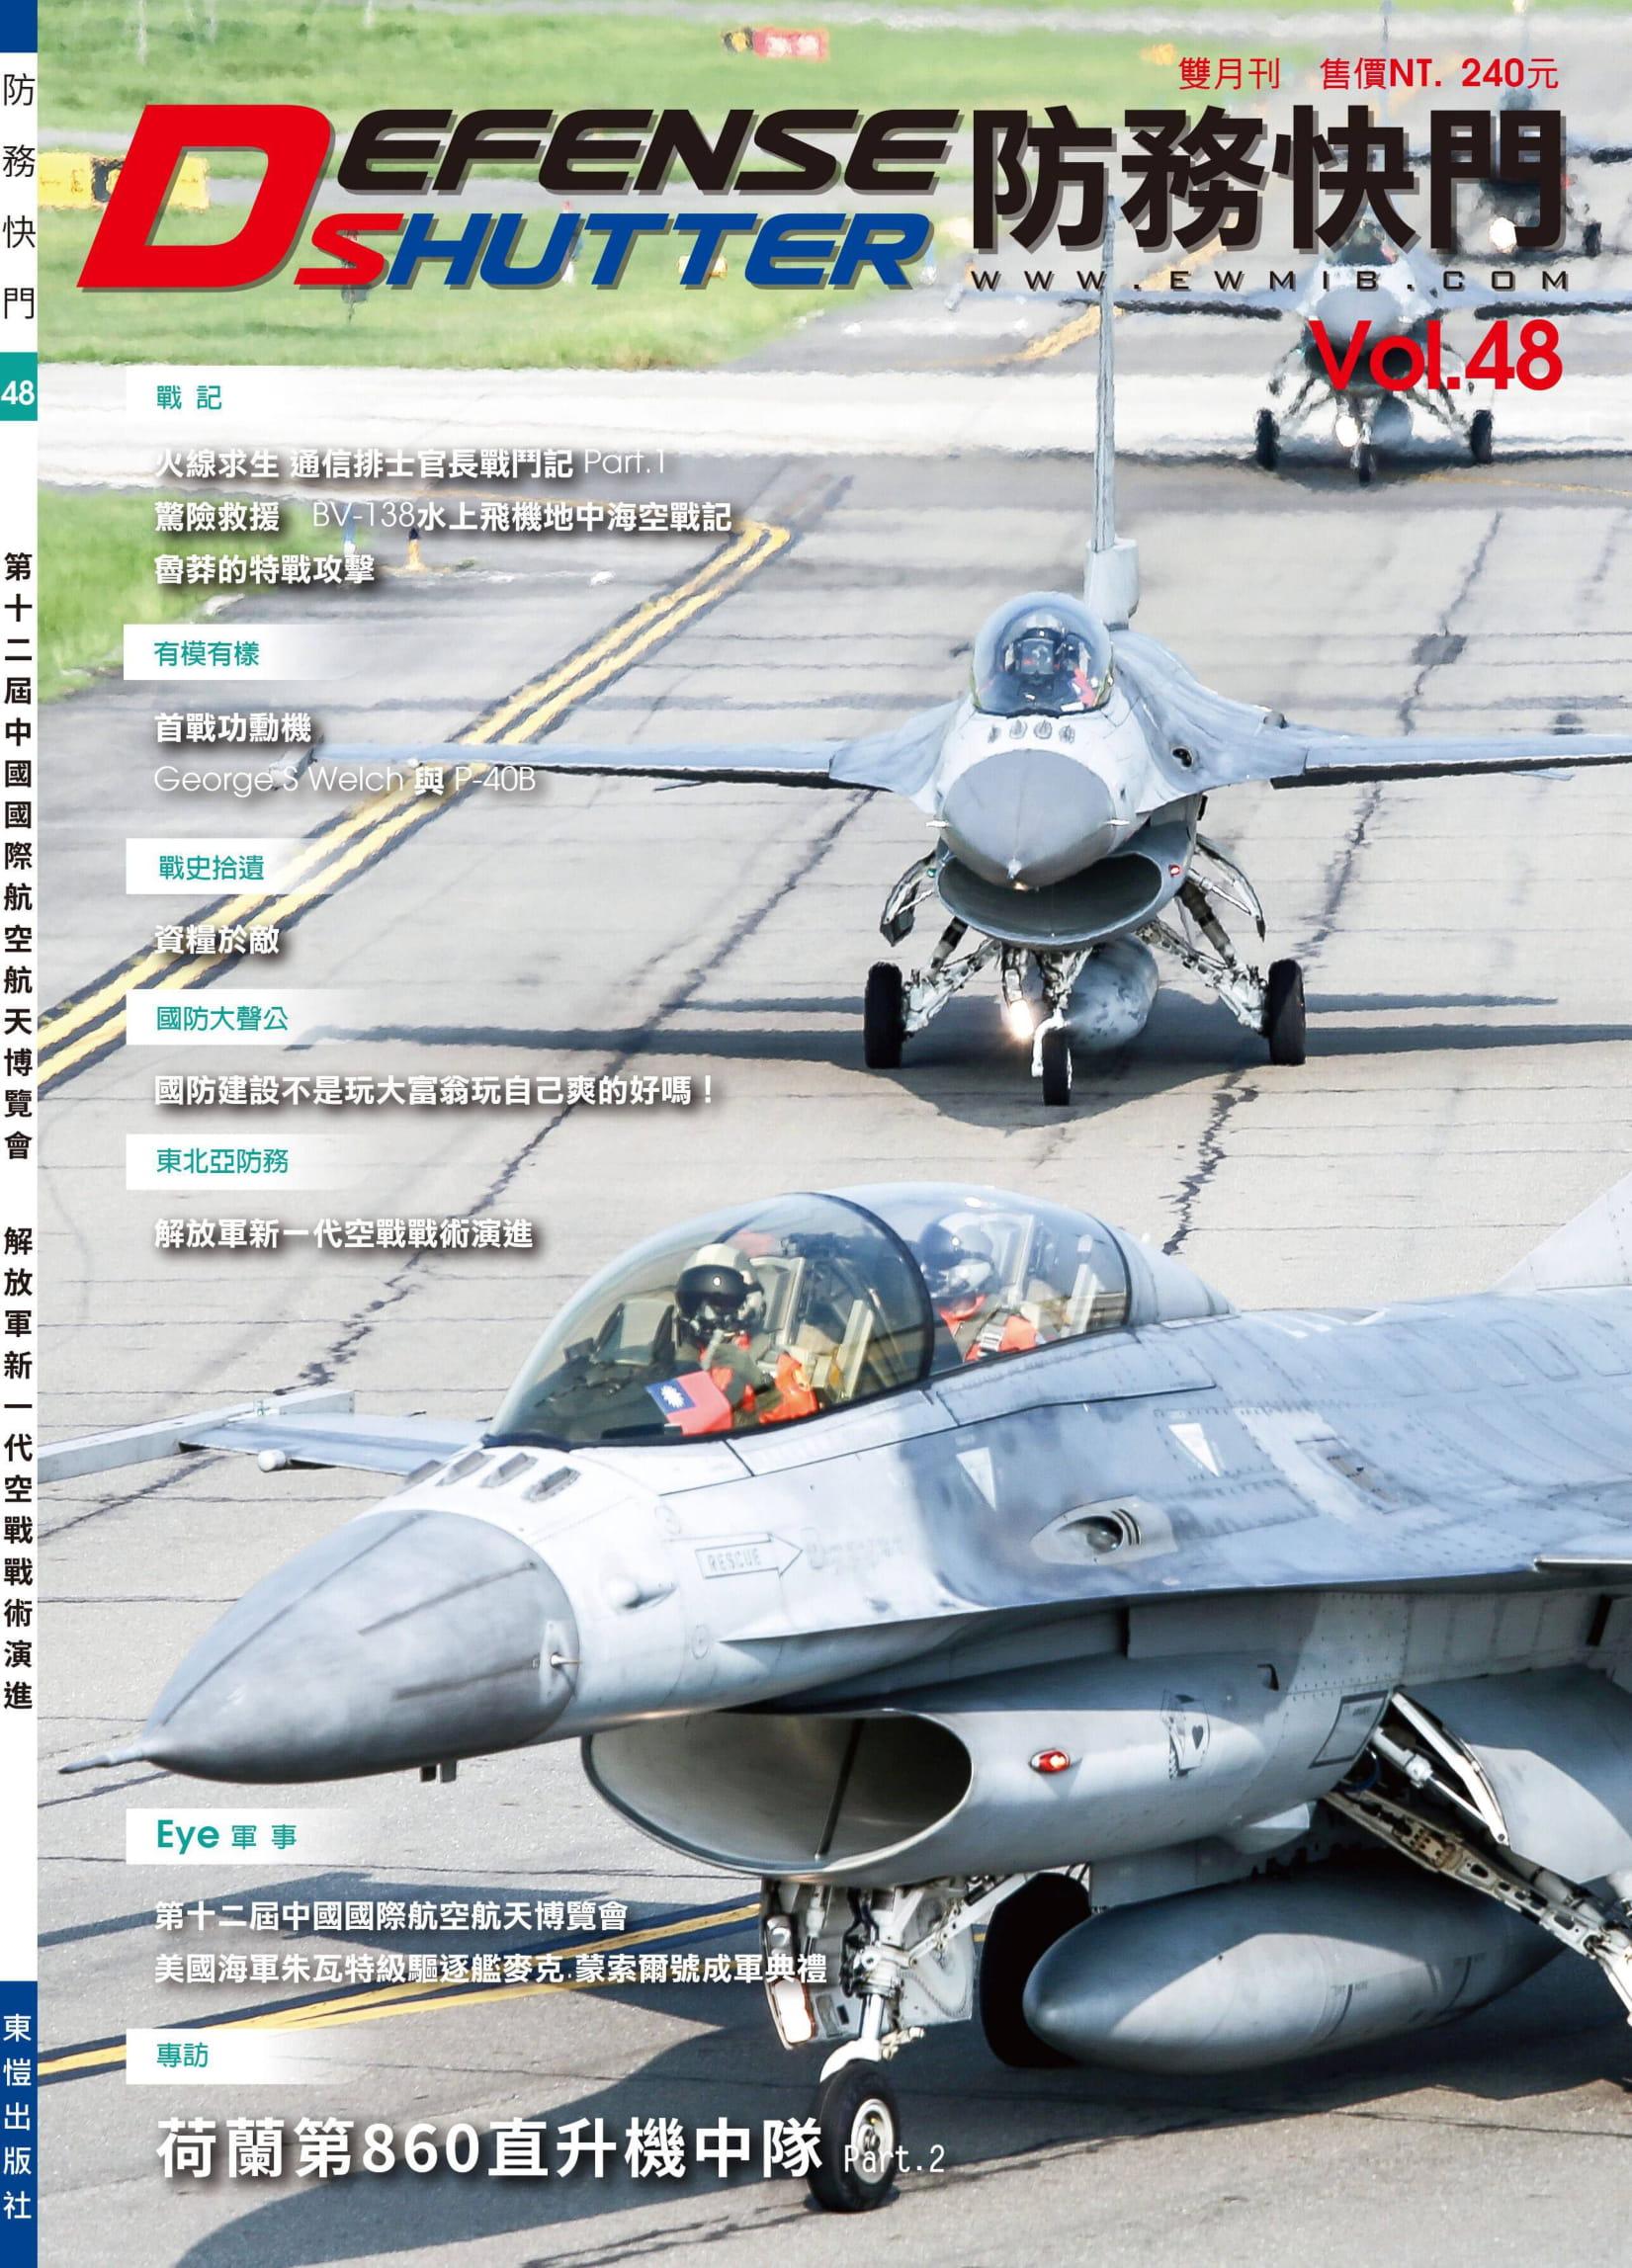 Defense Shutter (Taiwan)_2_Dutch NH90s-1